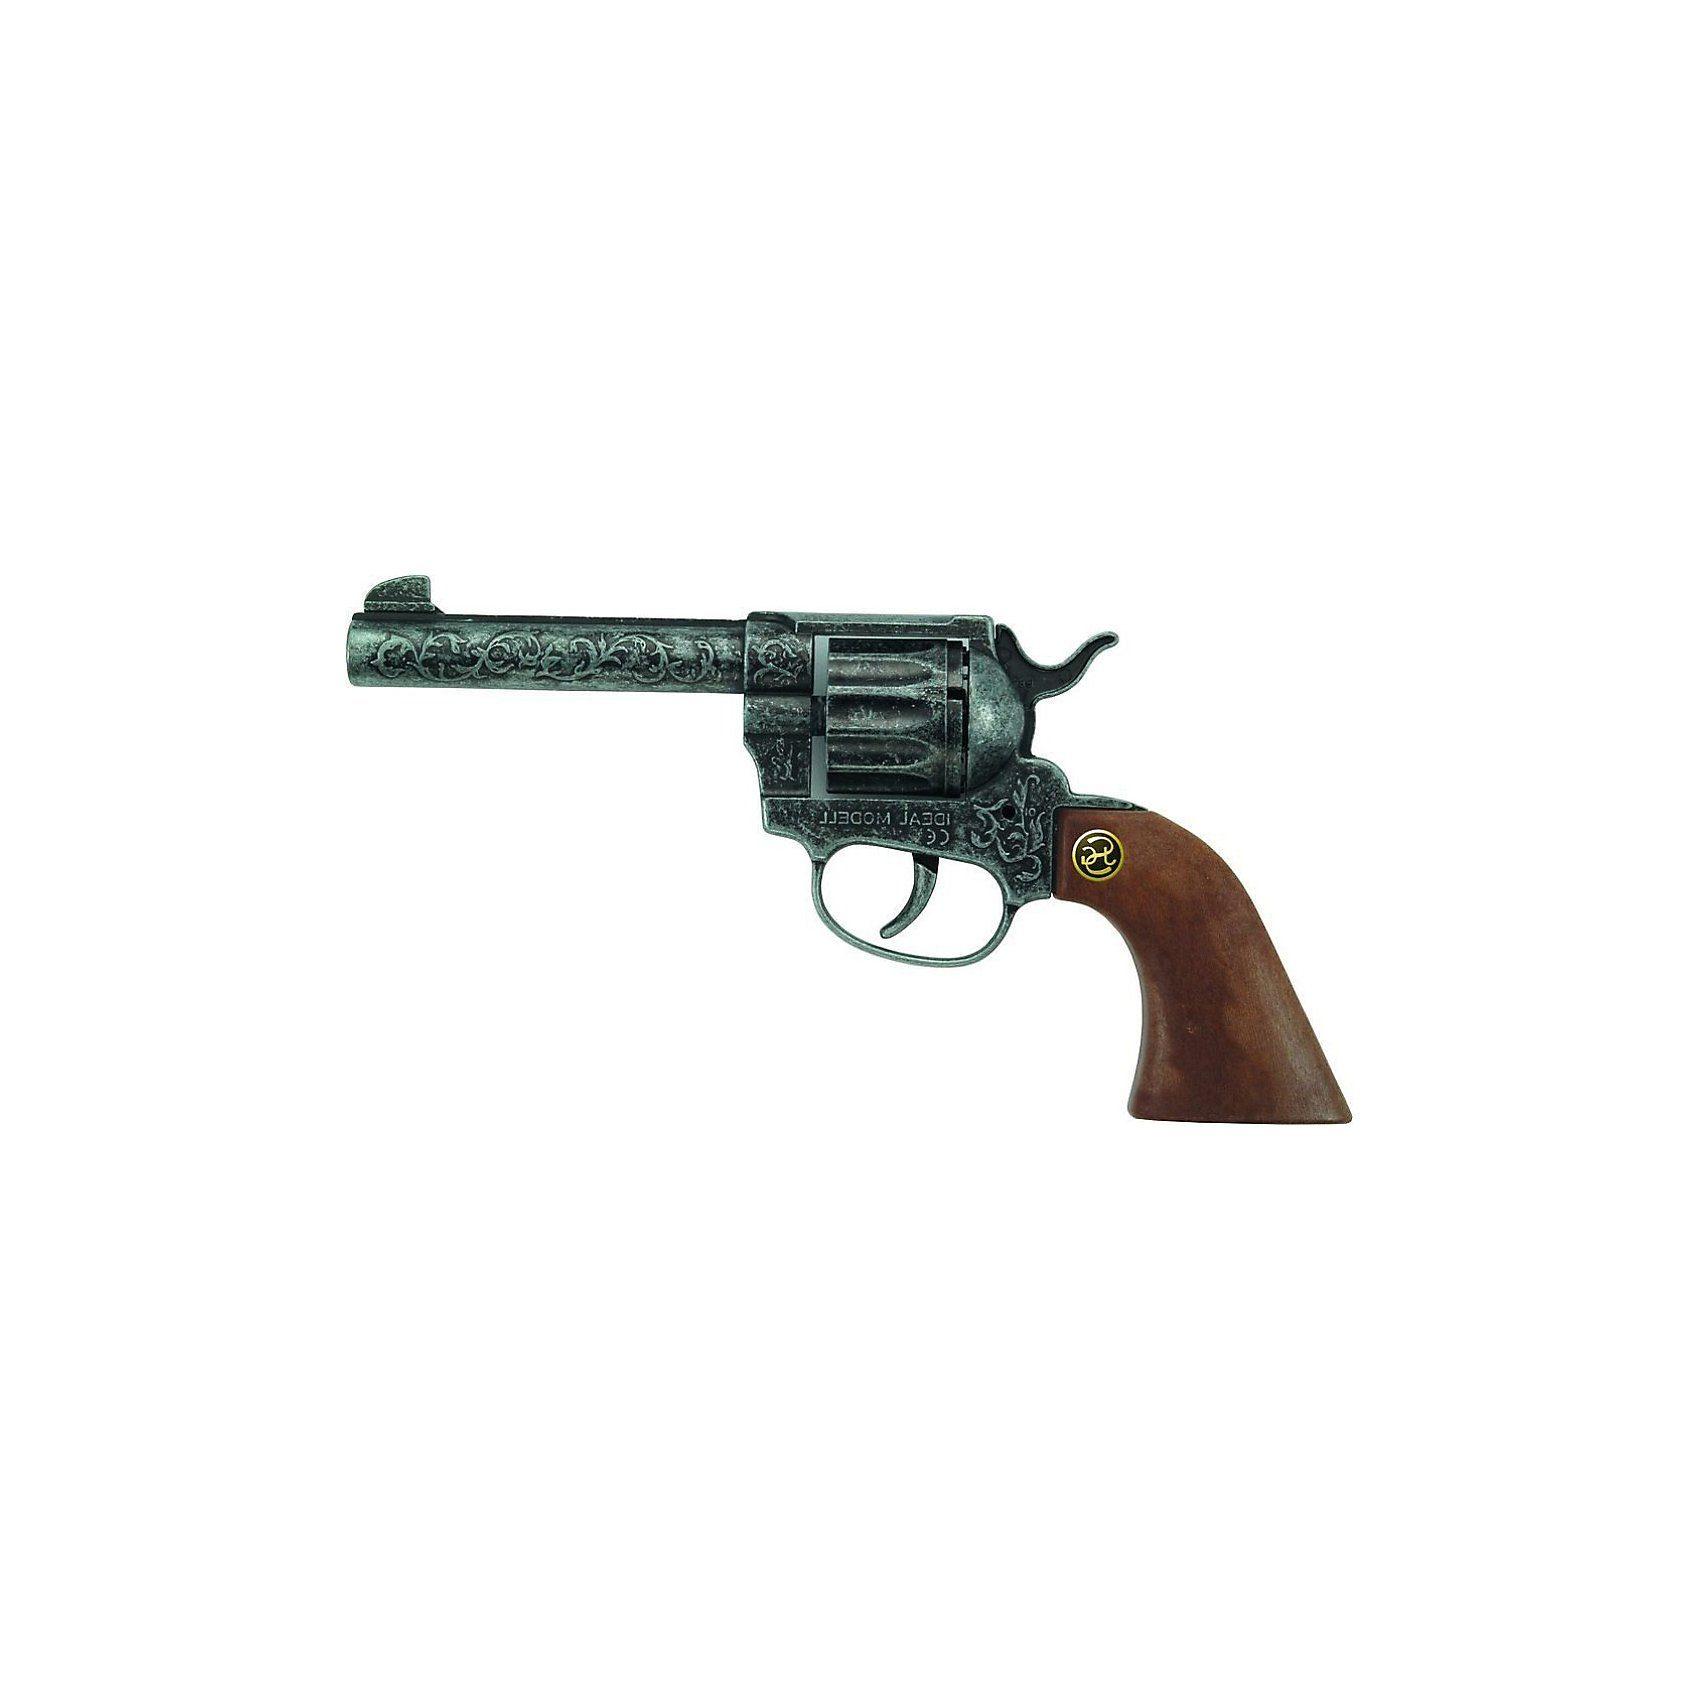 Schrödel Western-Revolver Magnum antik-silber